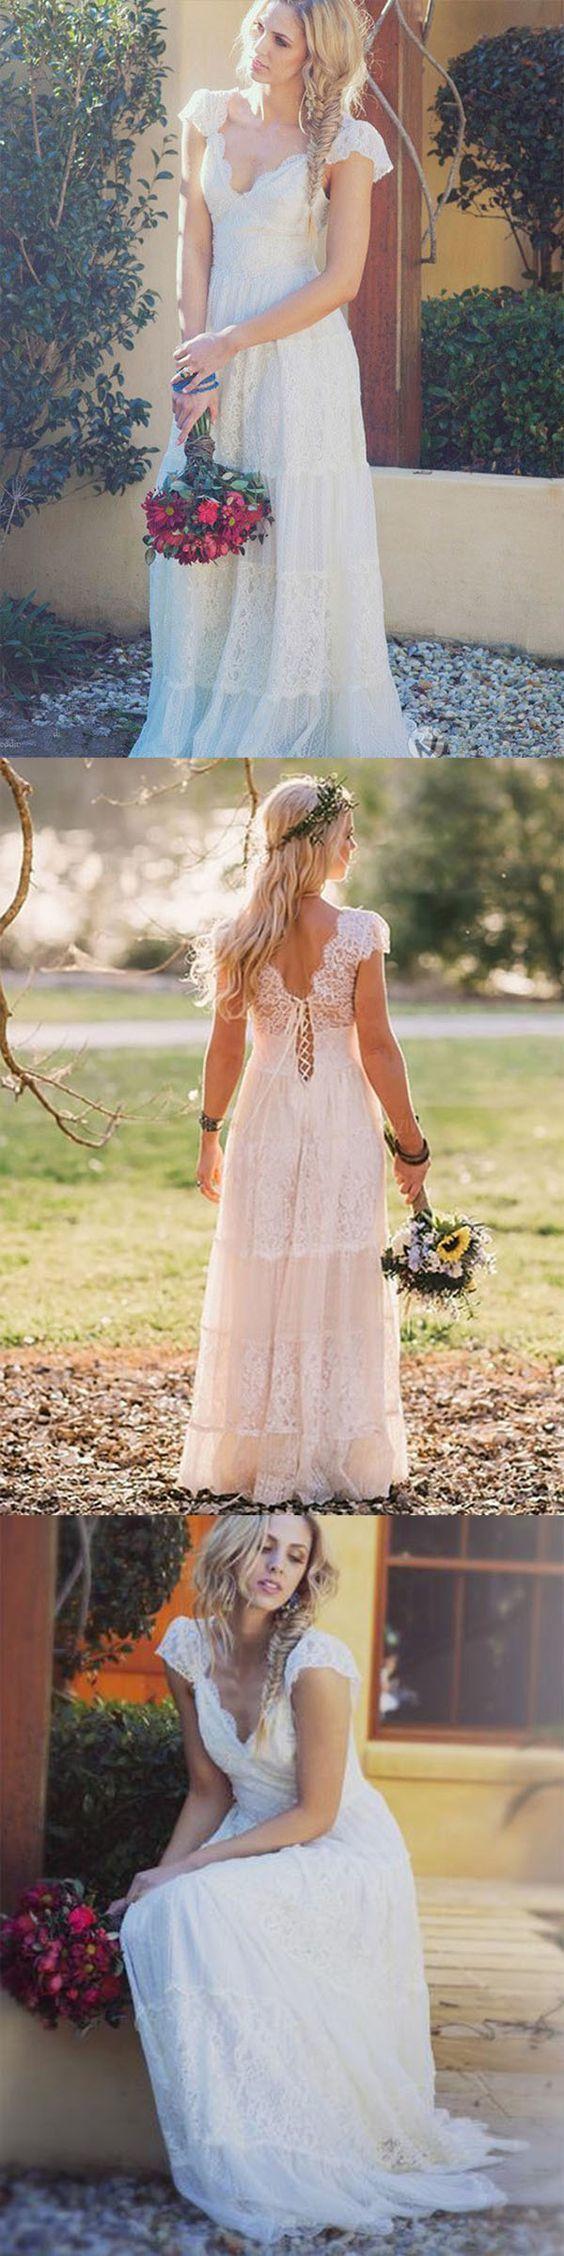 Unique A-Line Scoop Sweep Train Wedding Dress , Modest Cap Sleeves Lace Beach